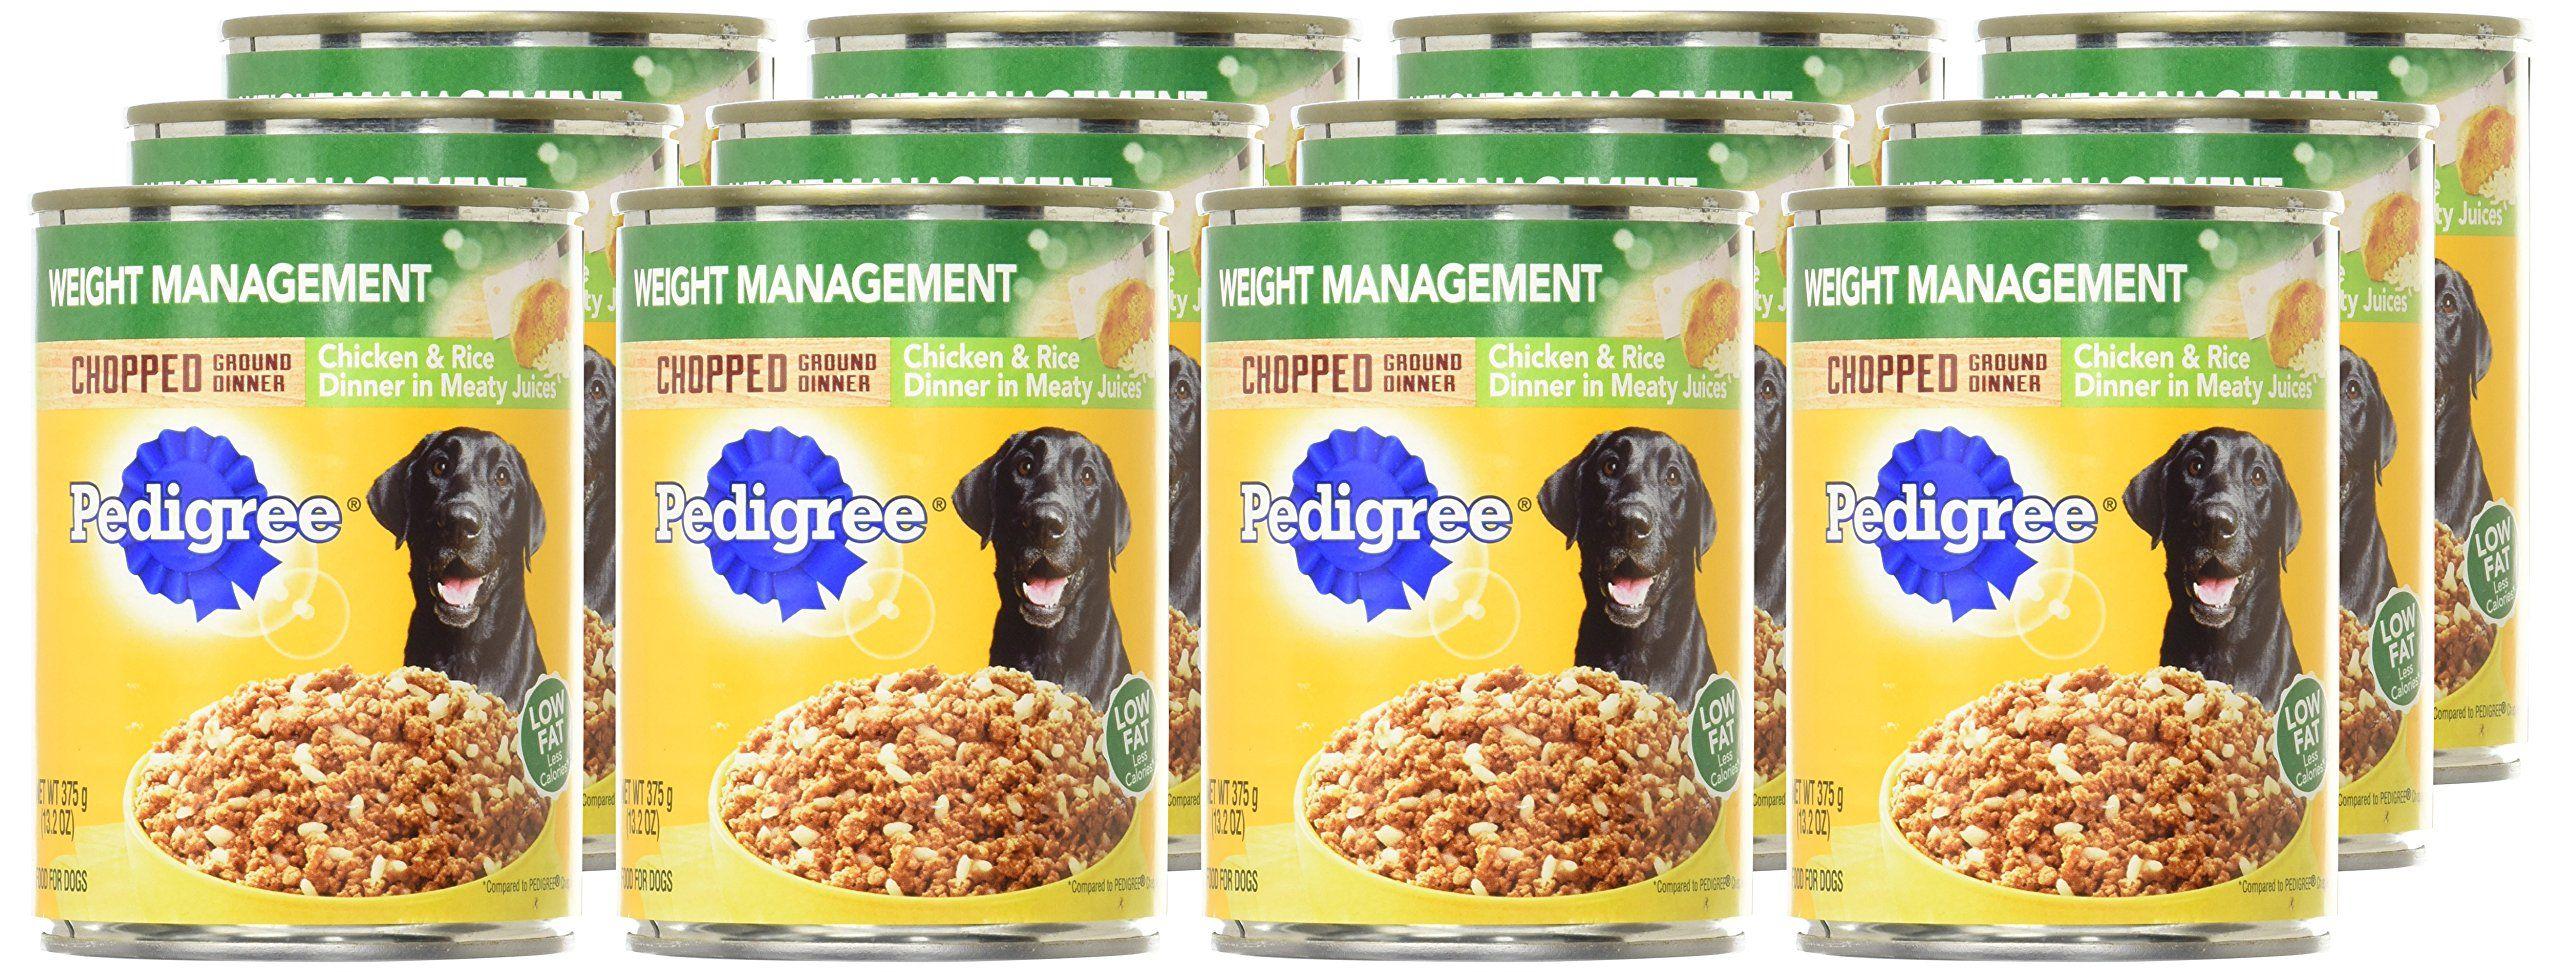 Pedigree Chopped Ground Dinner Weight Management Chicken And Rice